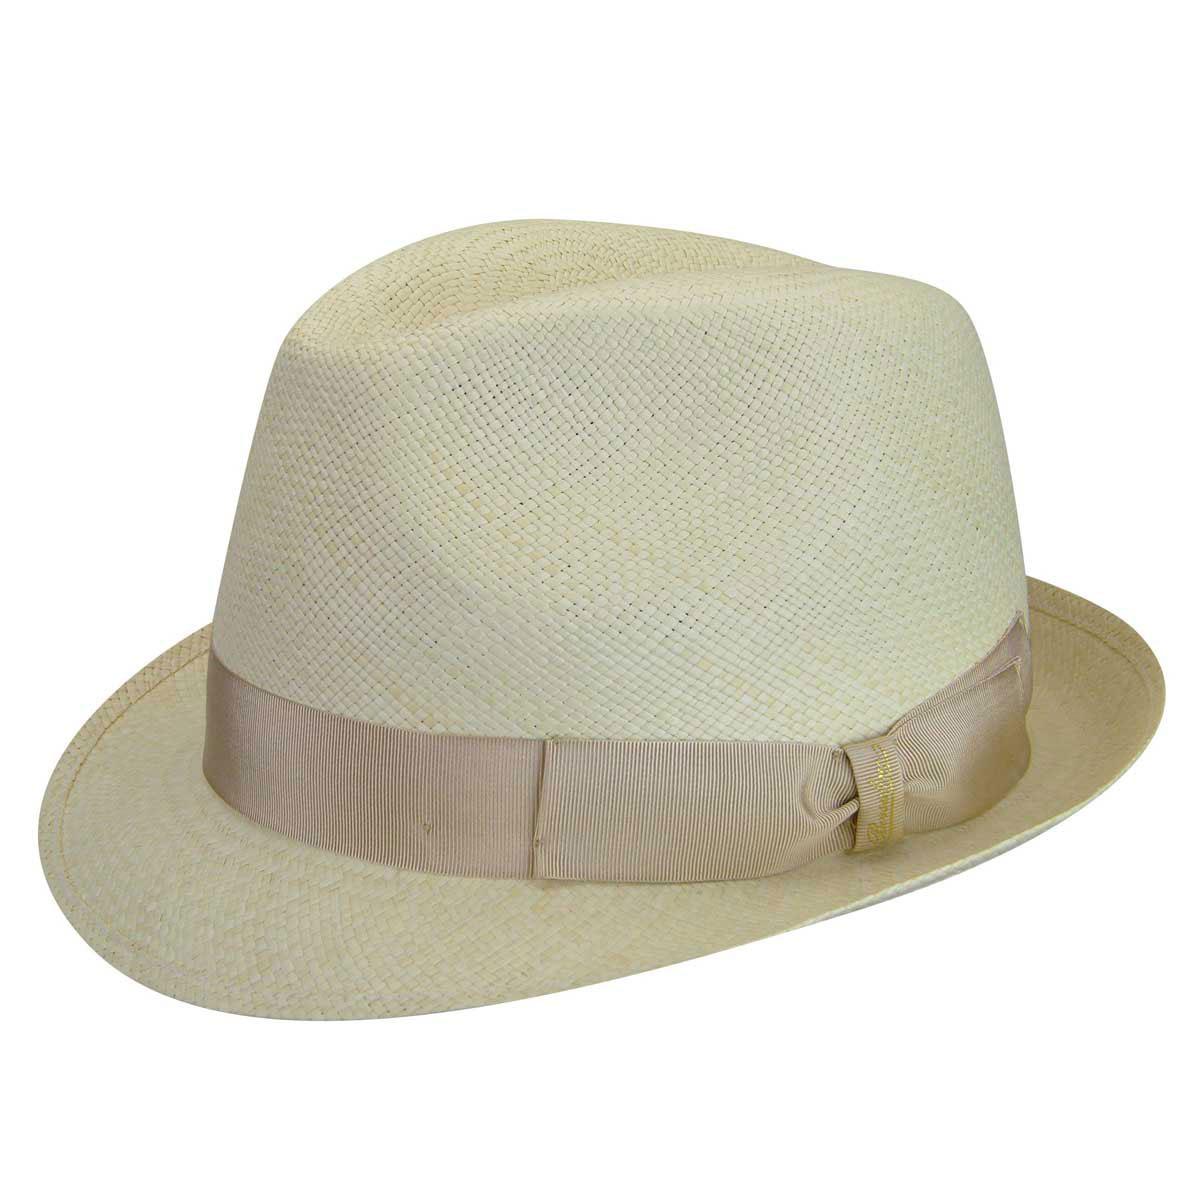 Panama Colorato Stingy Brim Fedora $270.00 AT vintagedancer.com